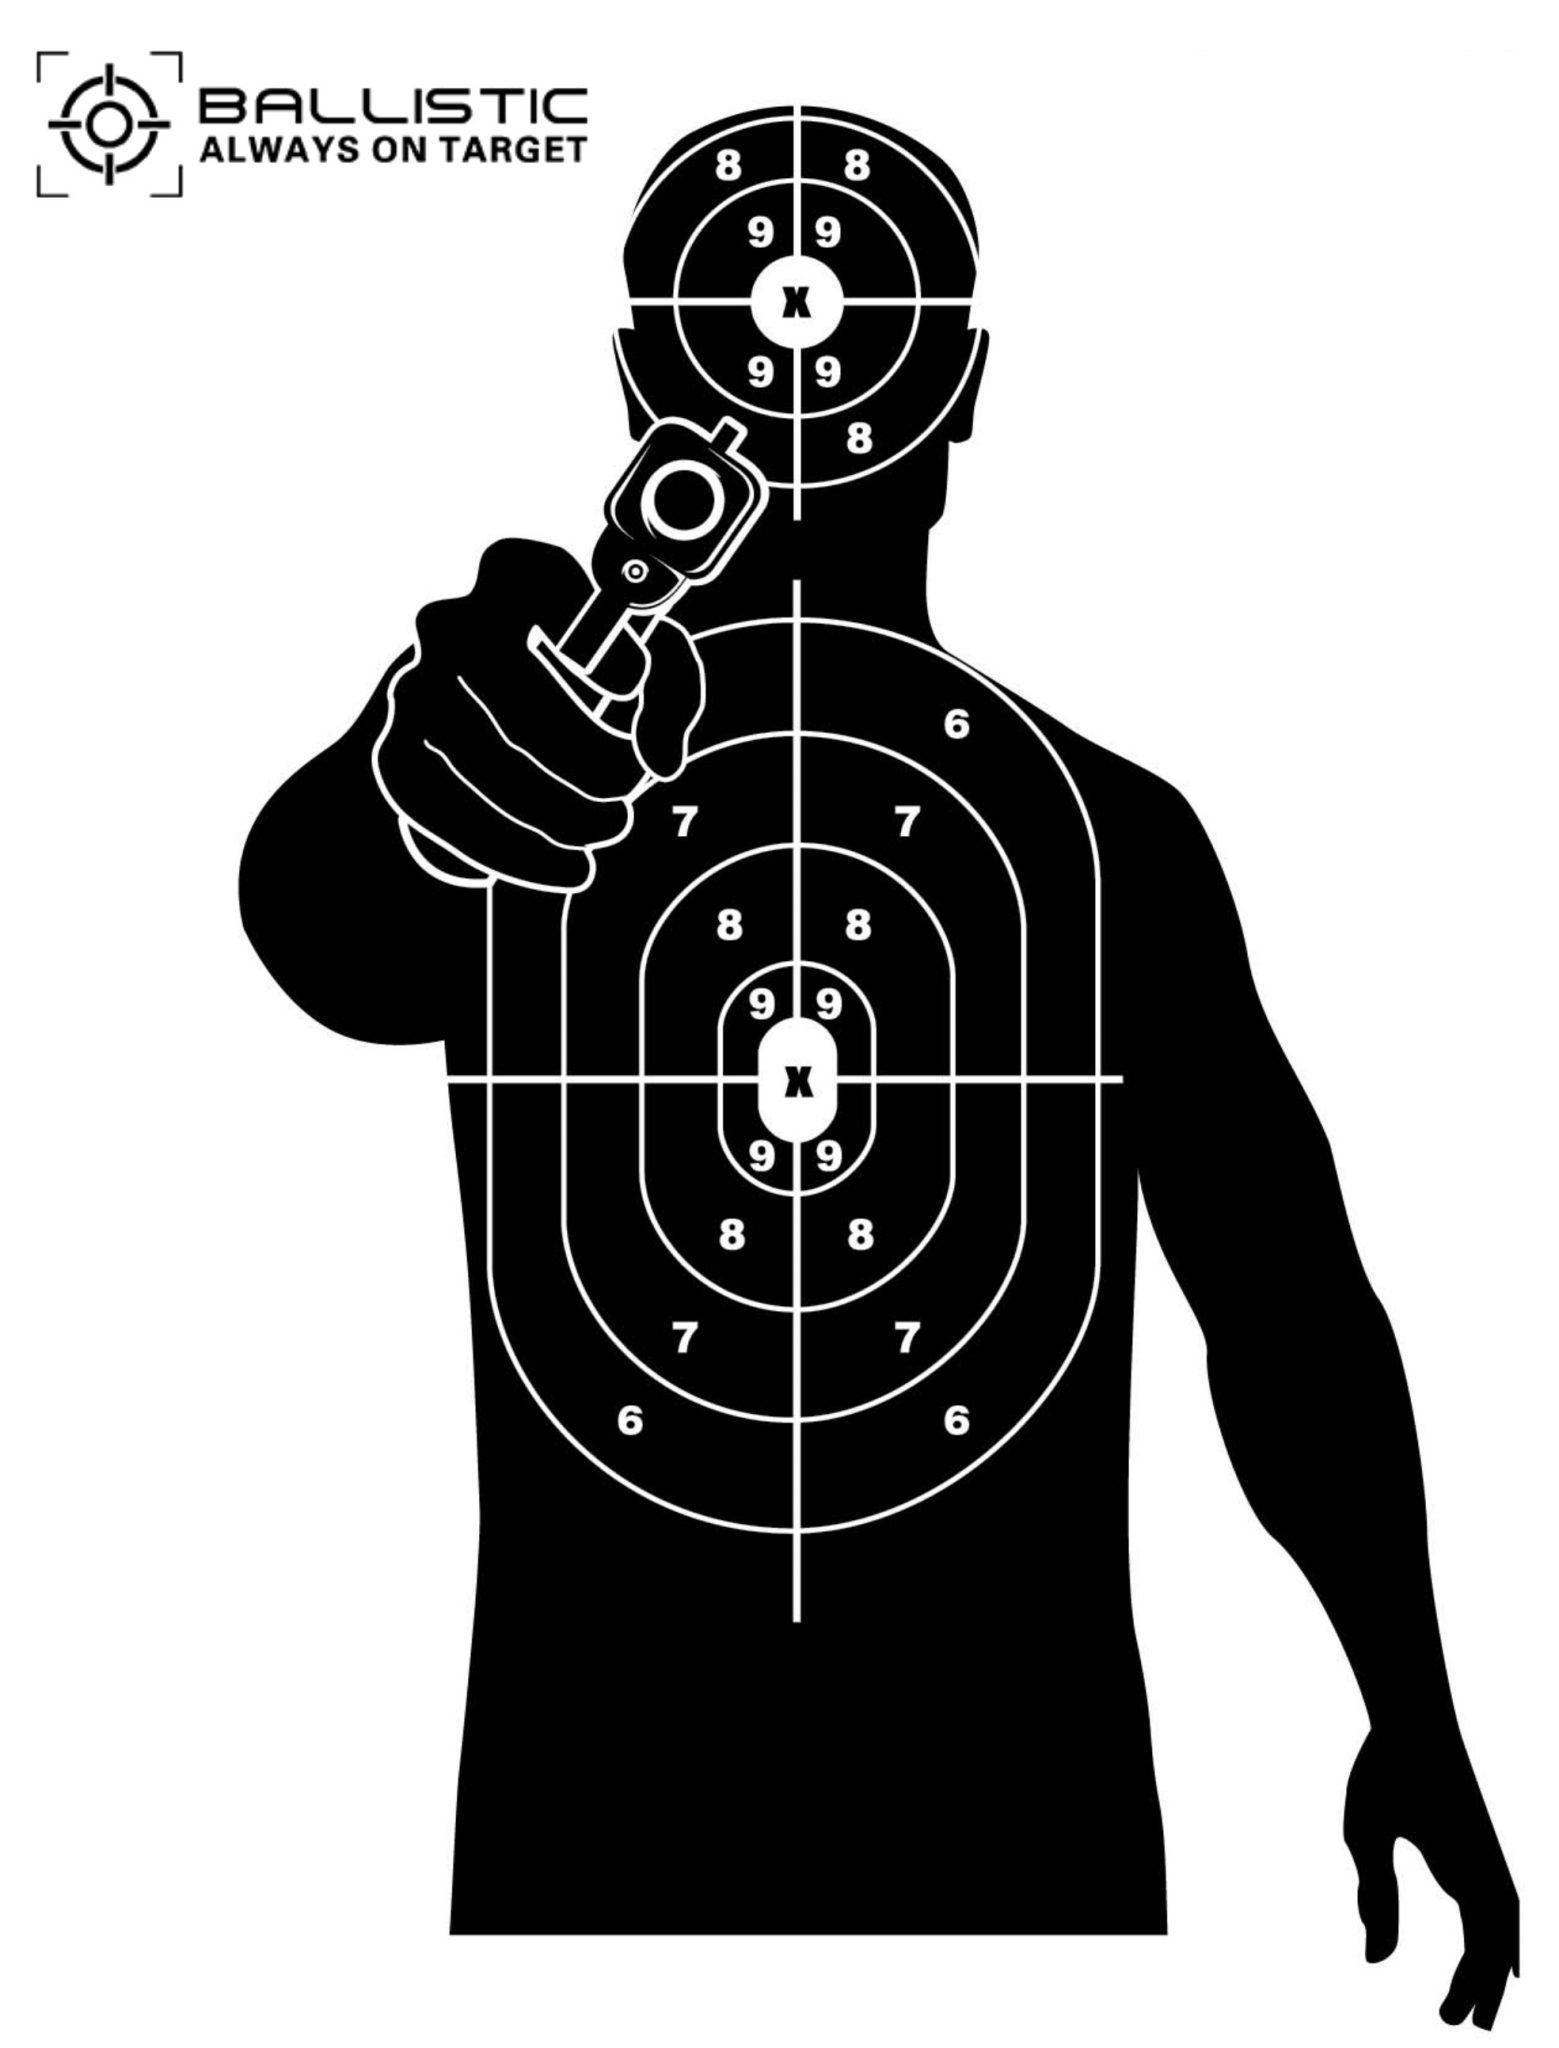 Ballistic Man Target